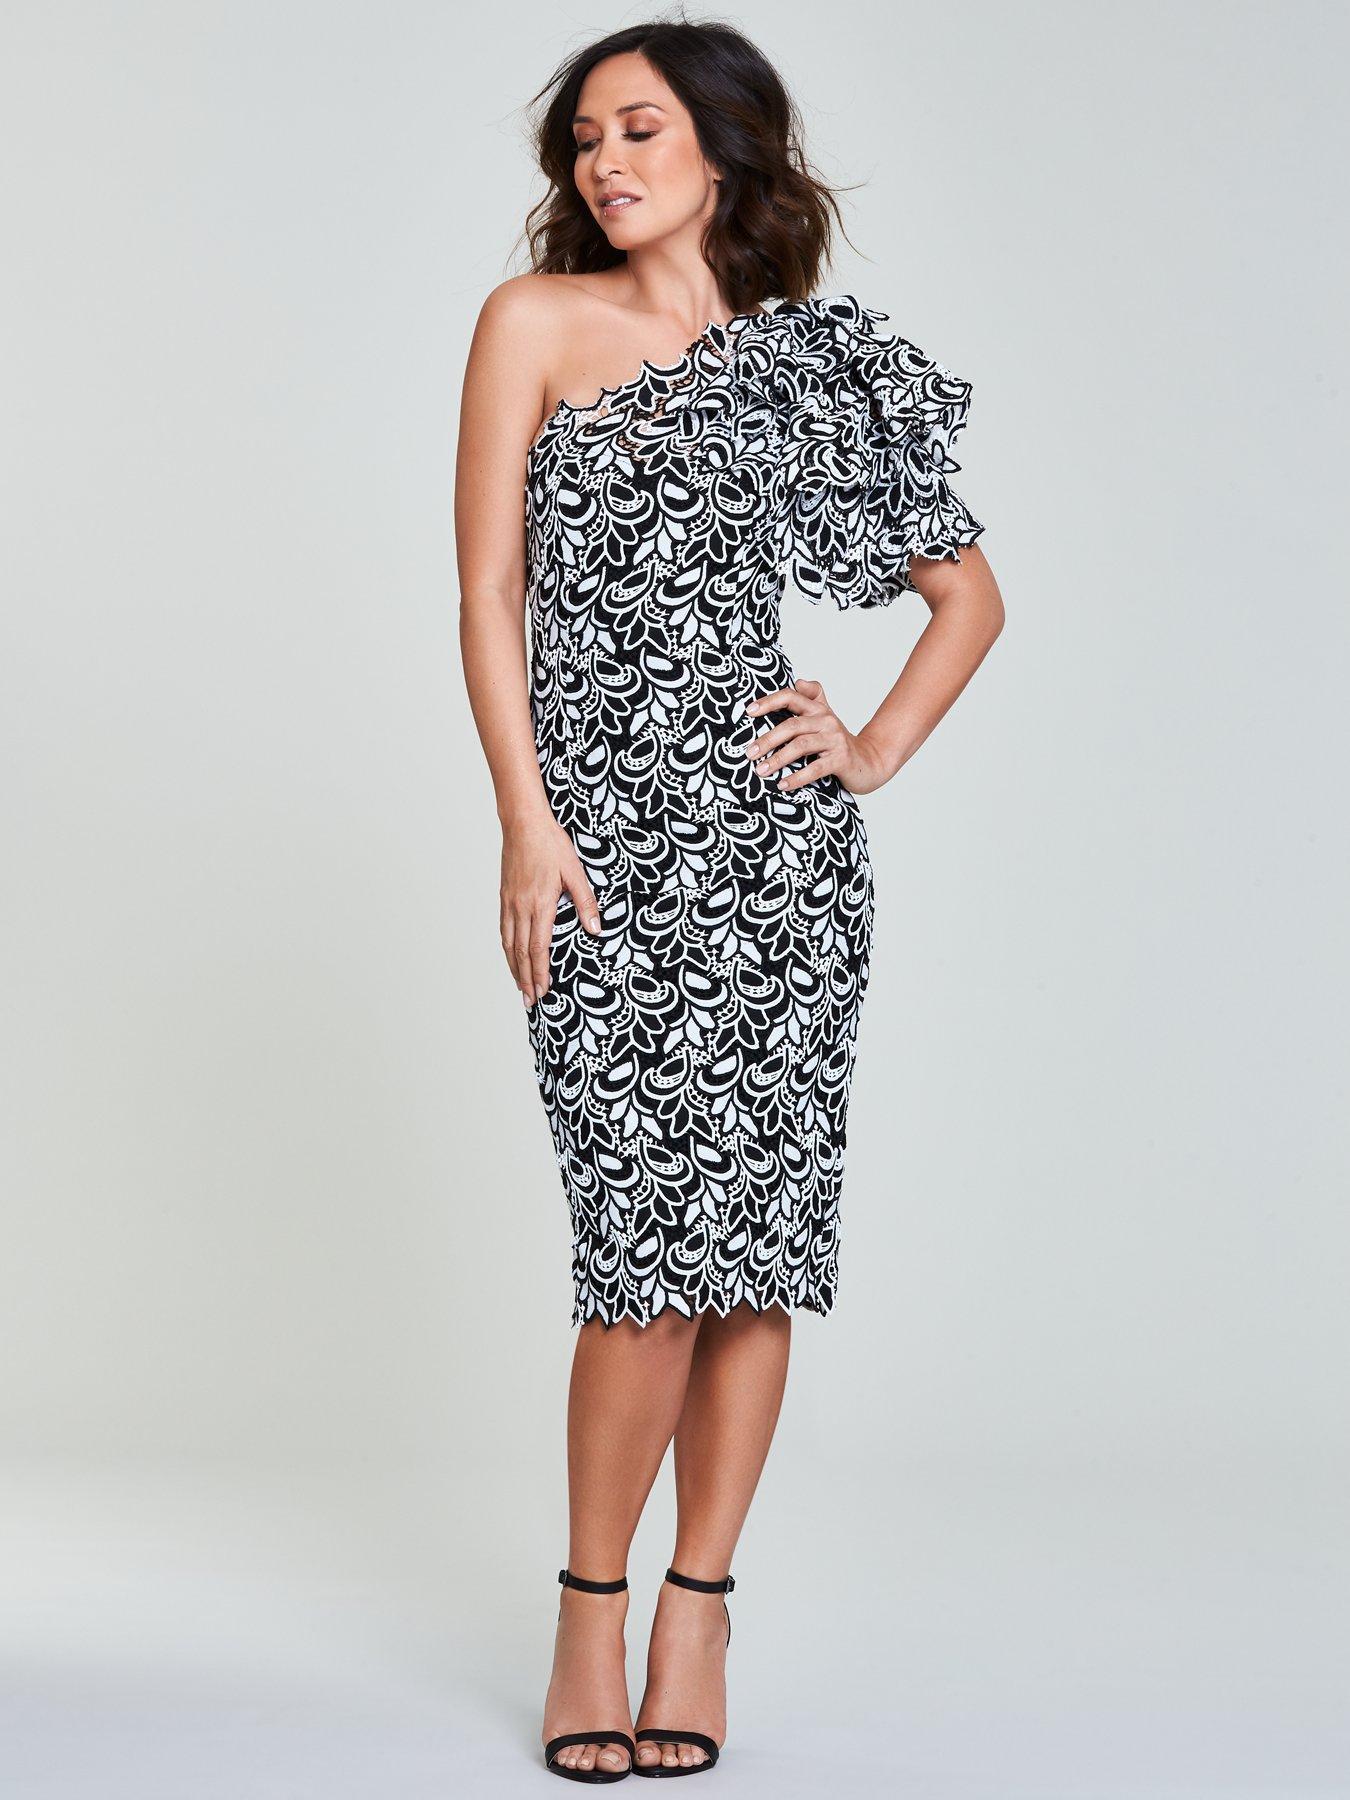 Myleene Klass Lace One Shoulder Pencil Dress - Mono